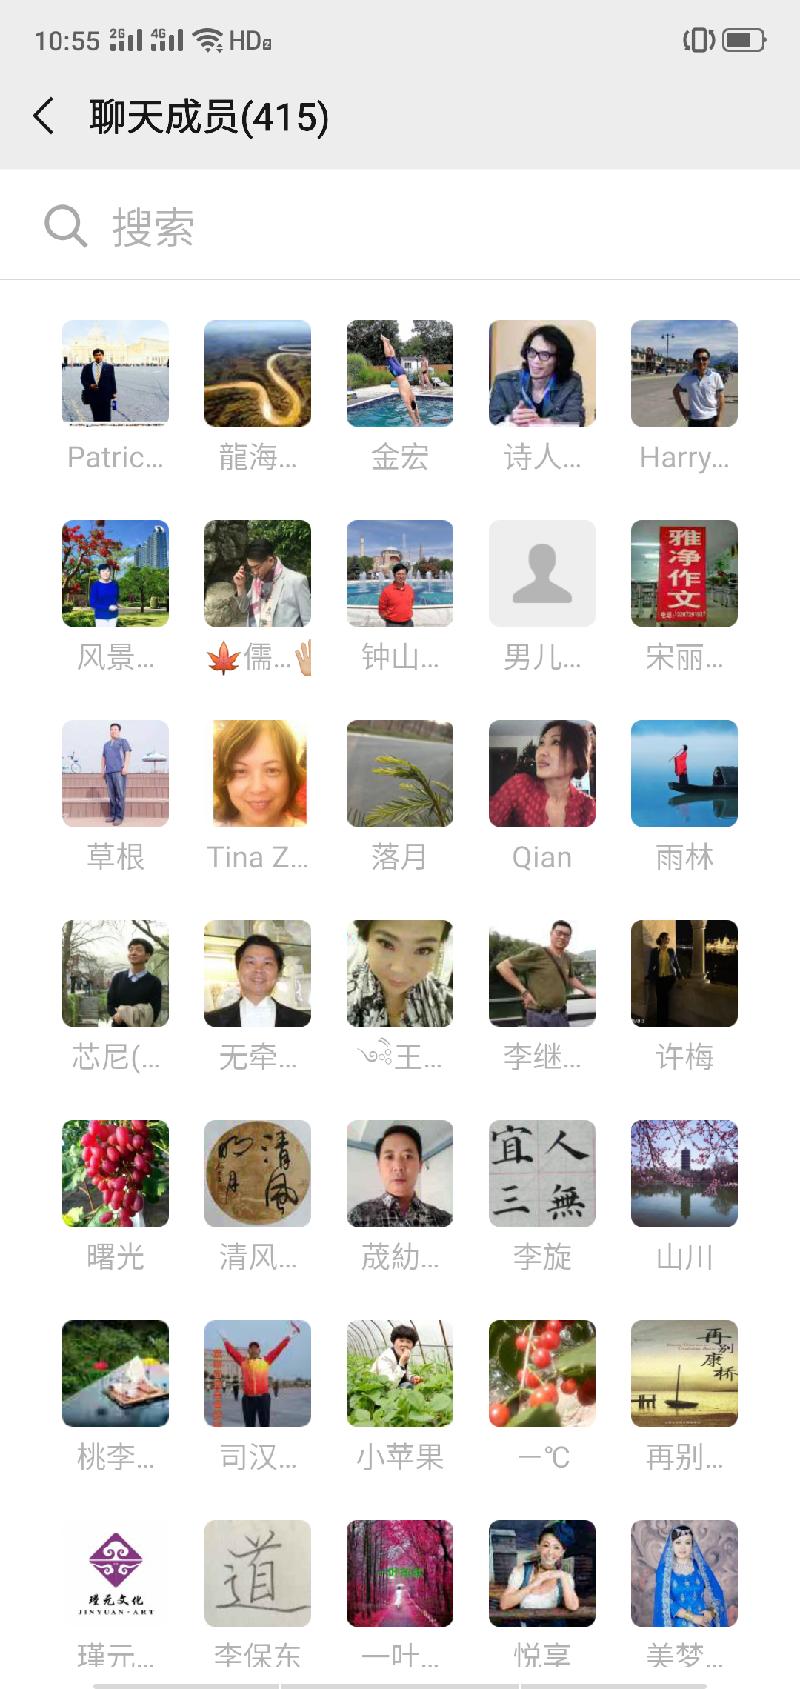 Screenshot_2020-01-15-10-55-55-96